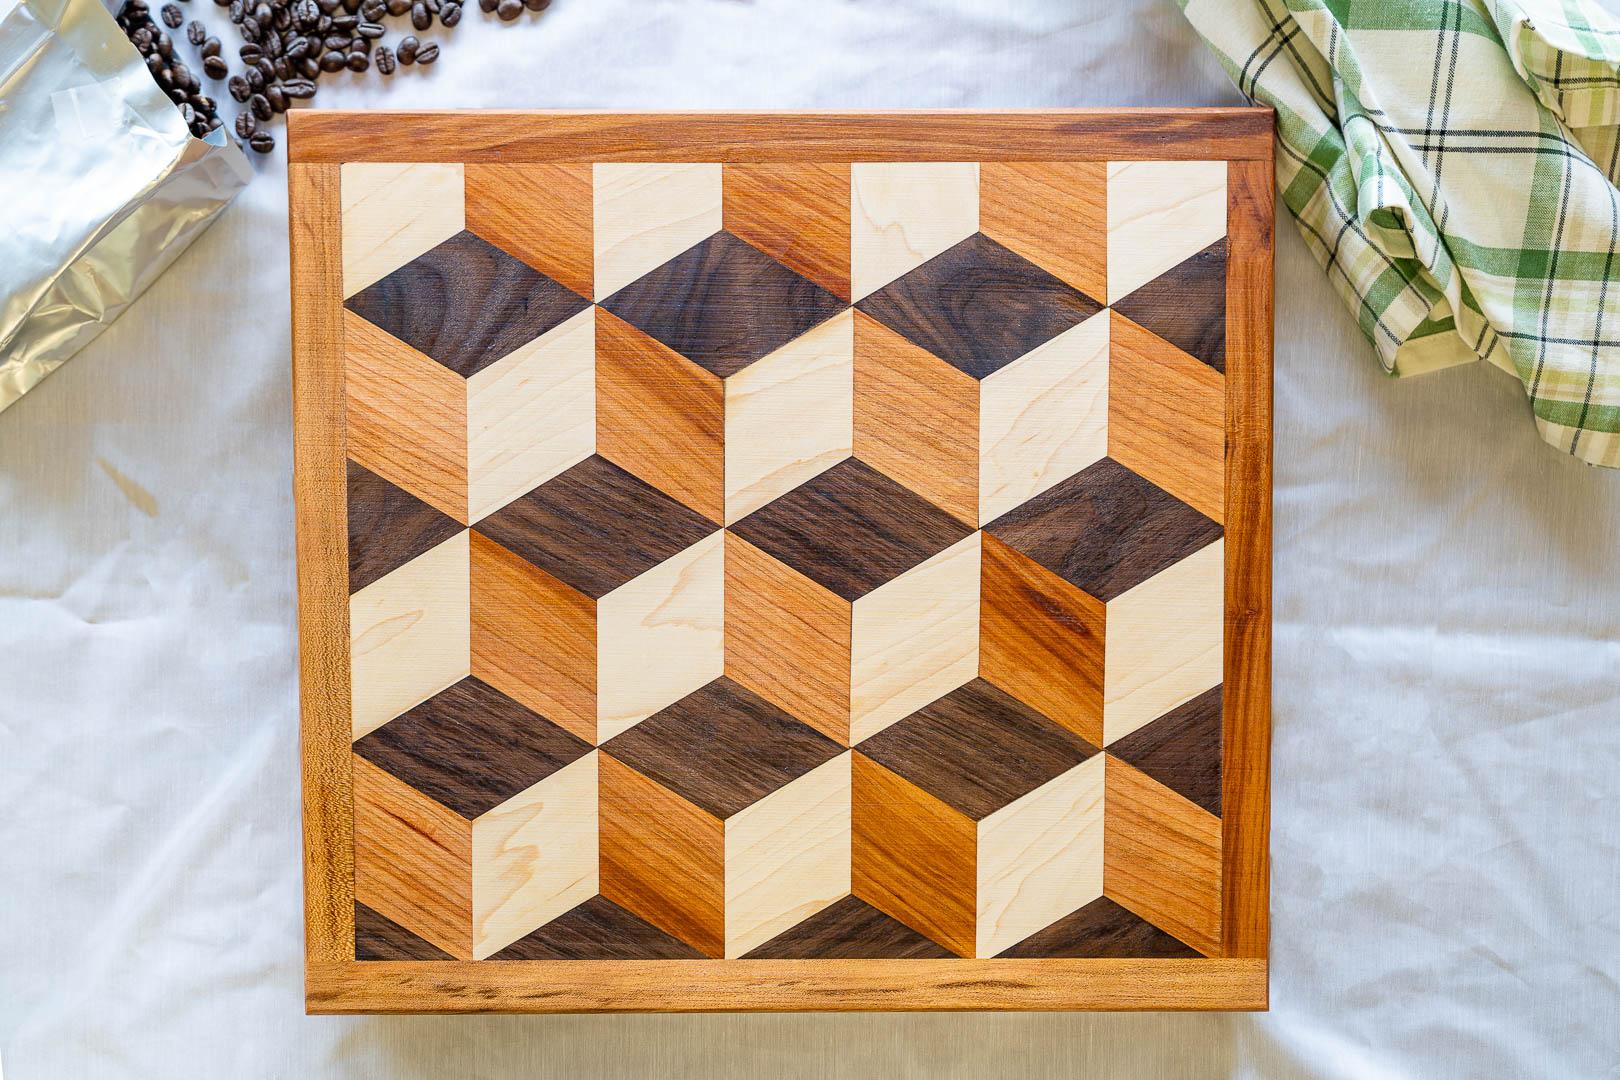 Hexagon Geometric Design Cutting Board-1.jpg